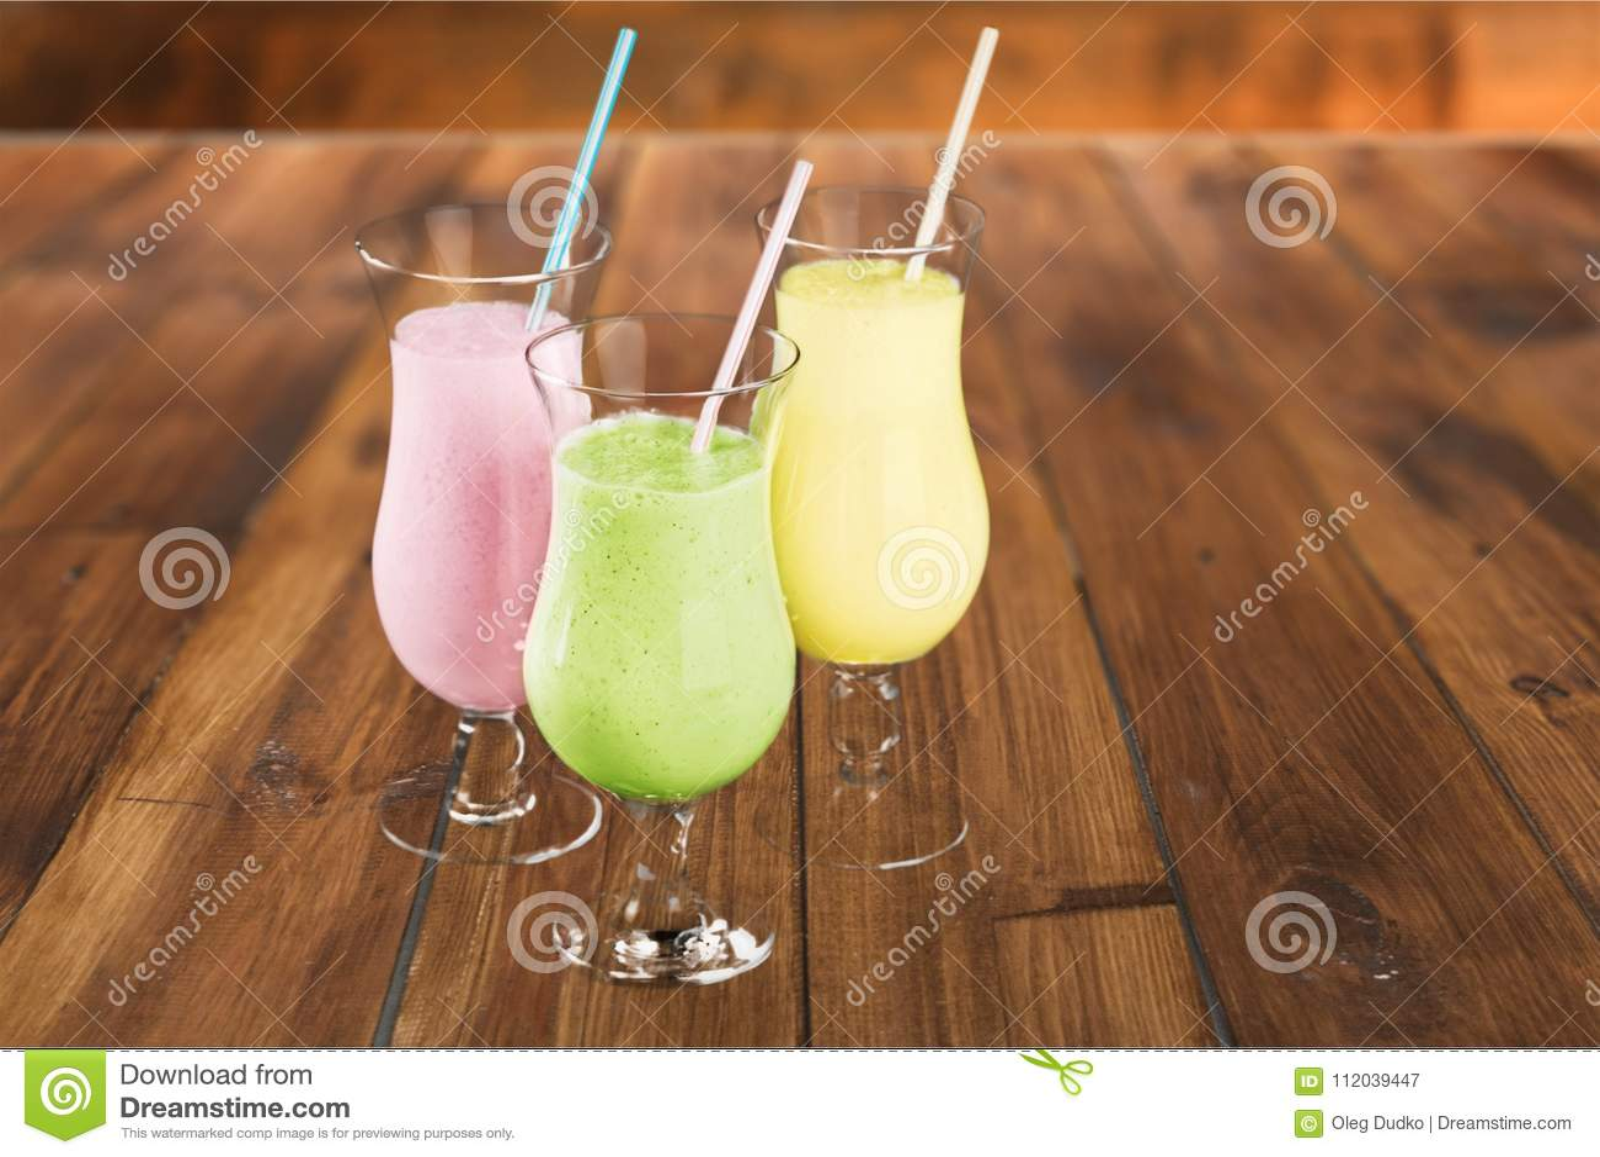 Colorful healthy milkshakes in glasses on table